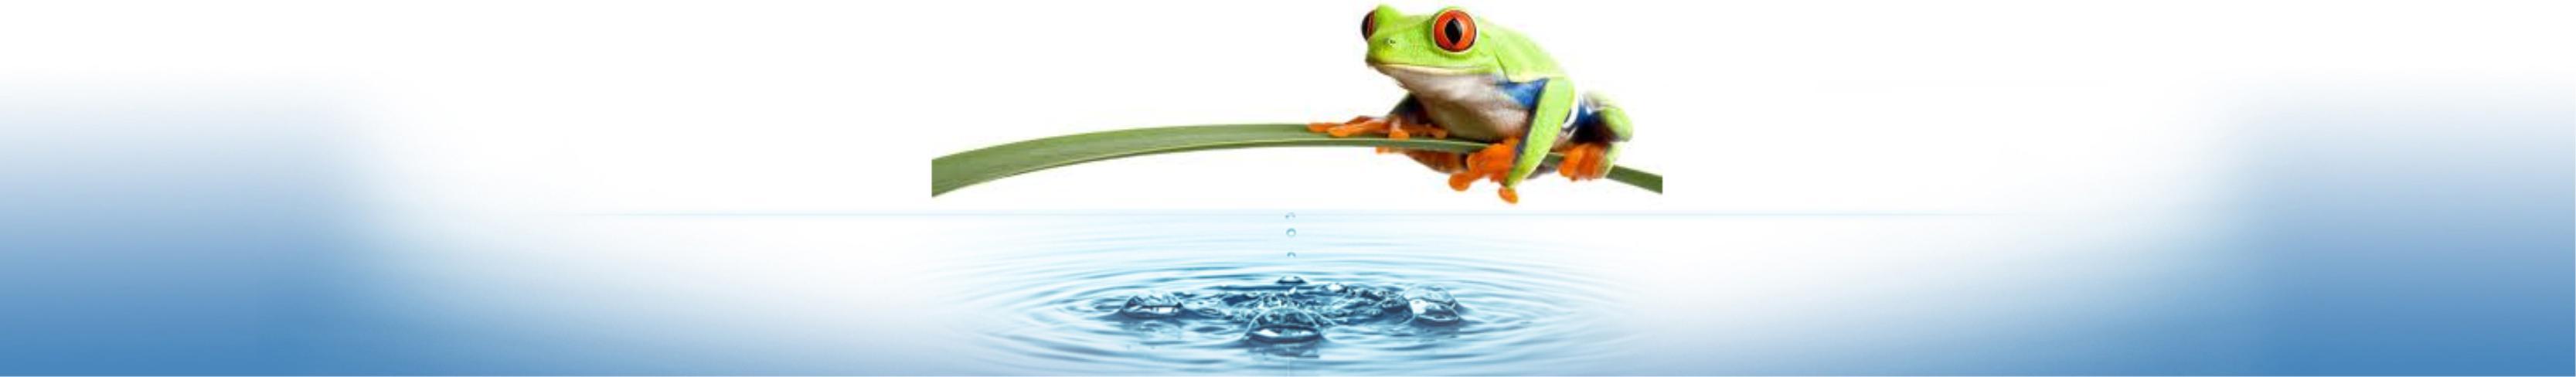 apt aqua pure water frog image